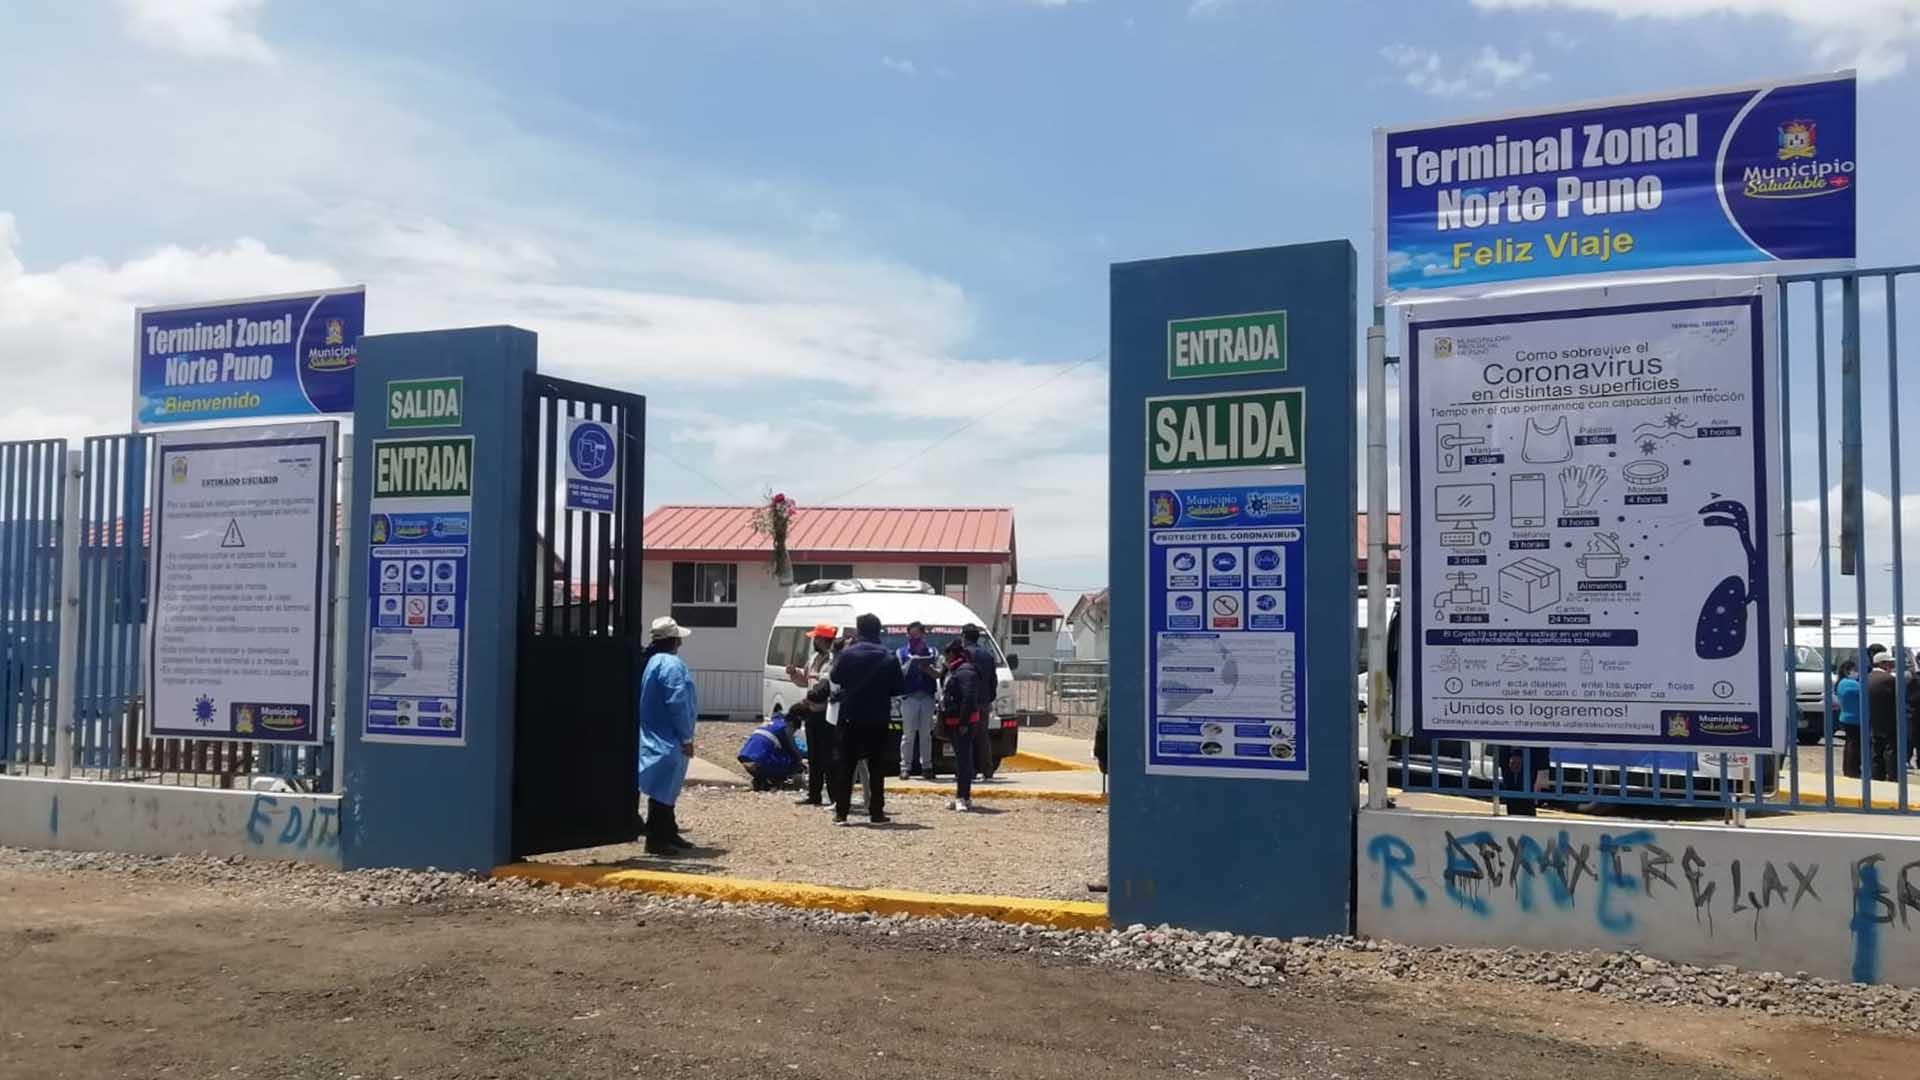 Terminal-zonal-norte-Puno